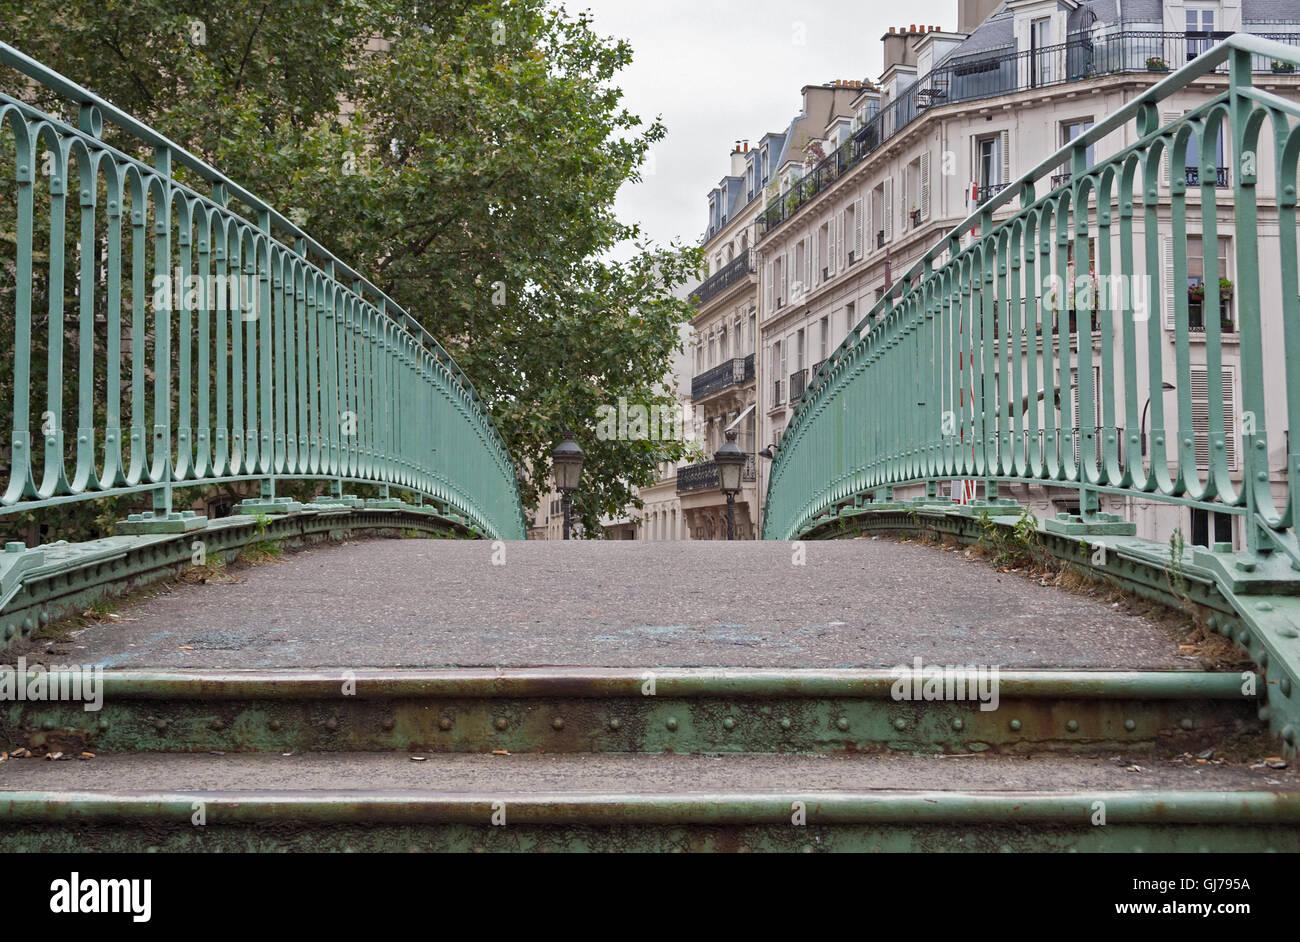 pedestrian bridge over the Saint Martin canal in Paris France - Stock Image